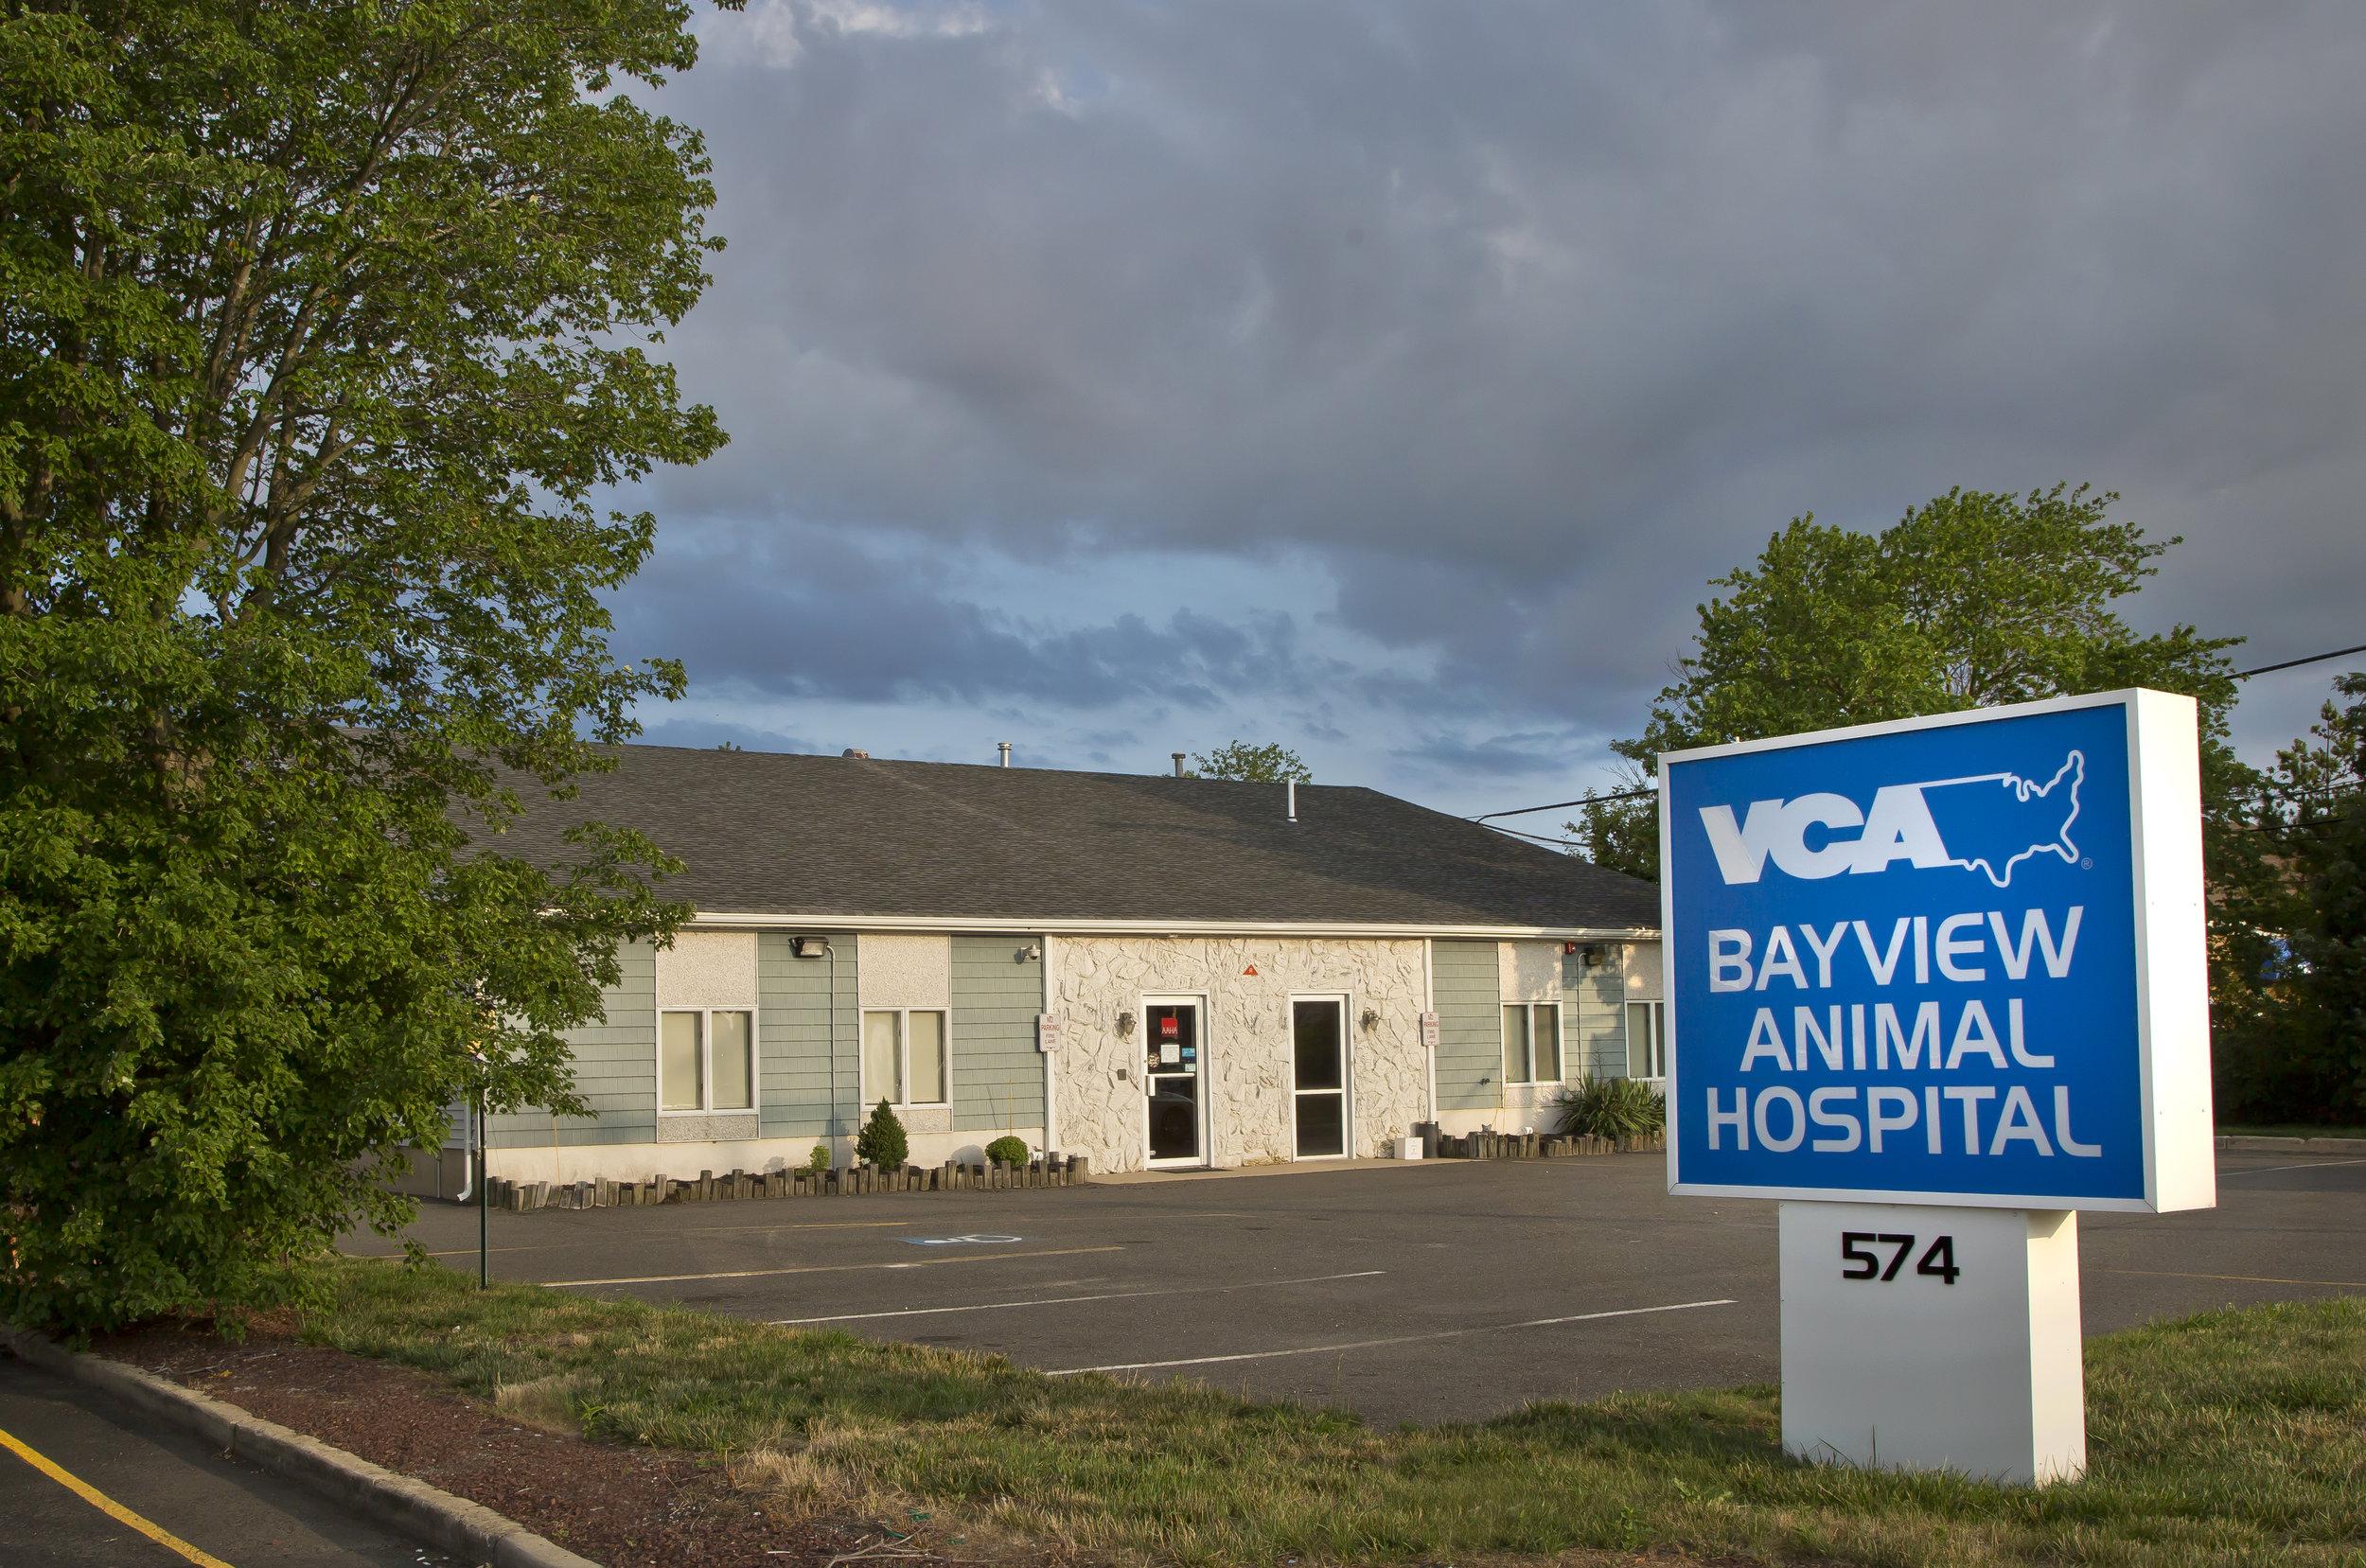 BV_Exterior 1.jpg